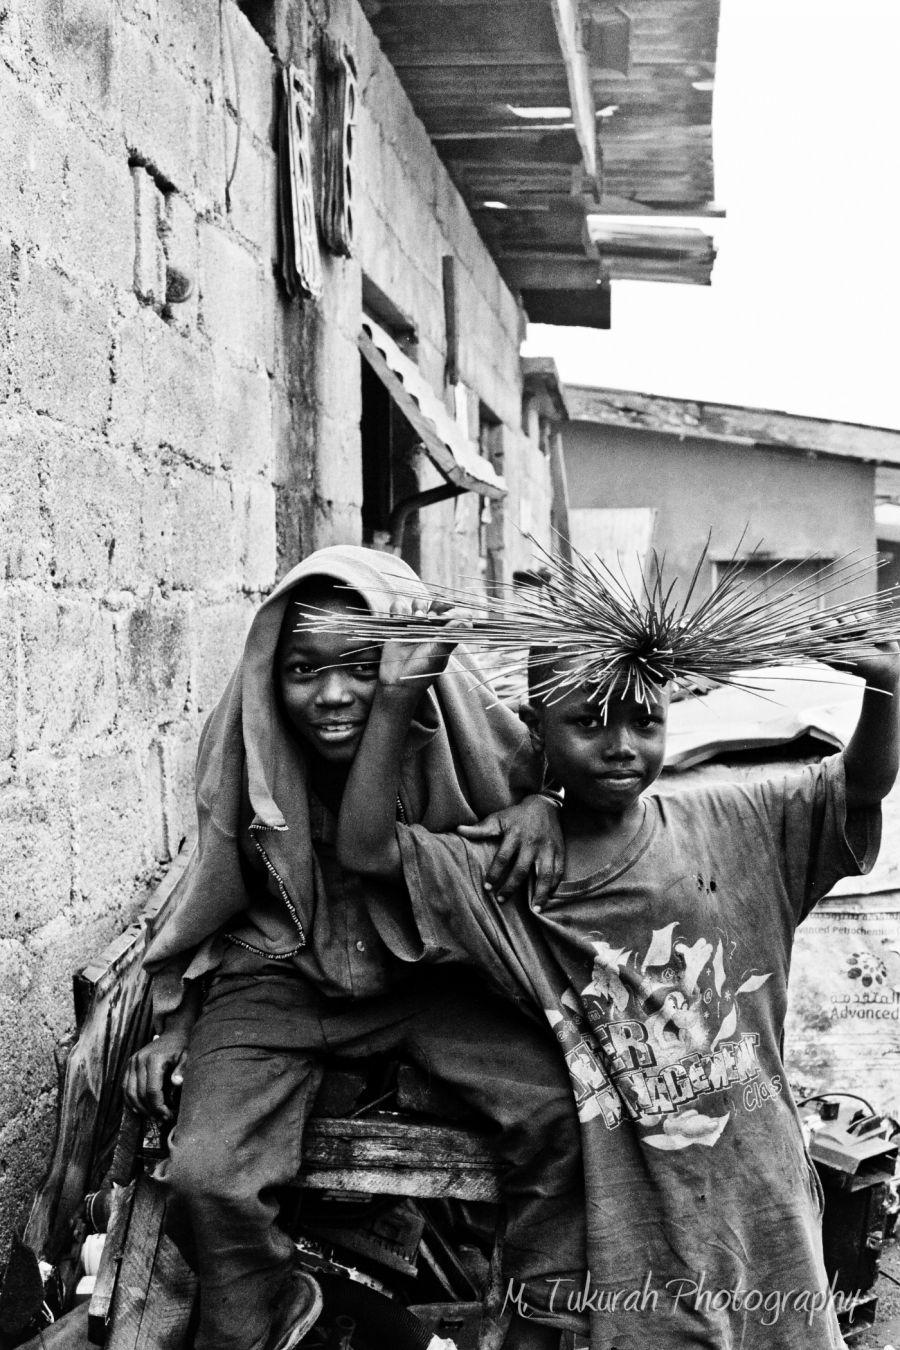 Musa Tukurah